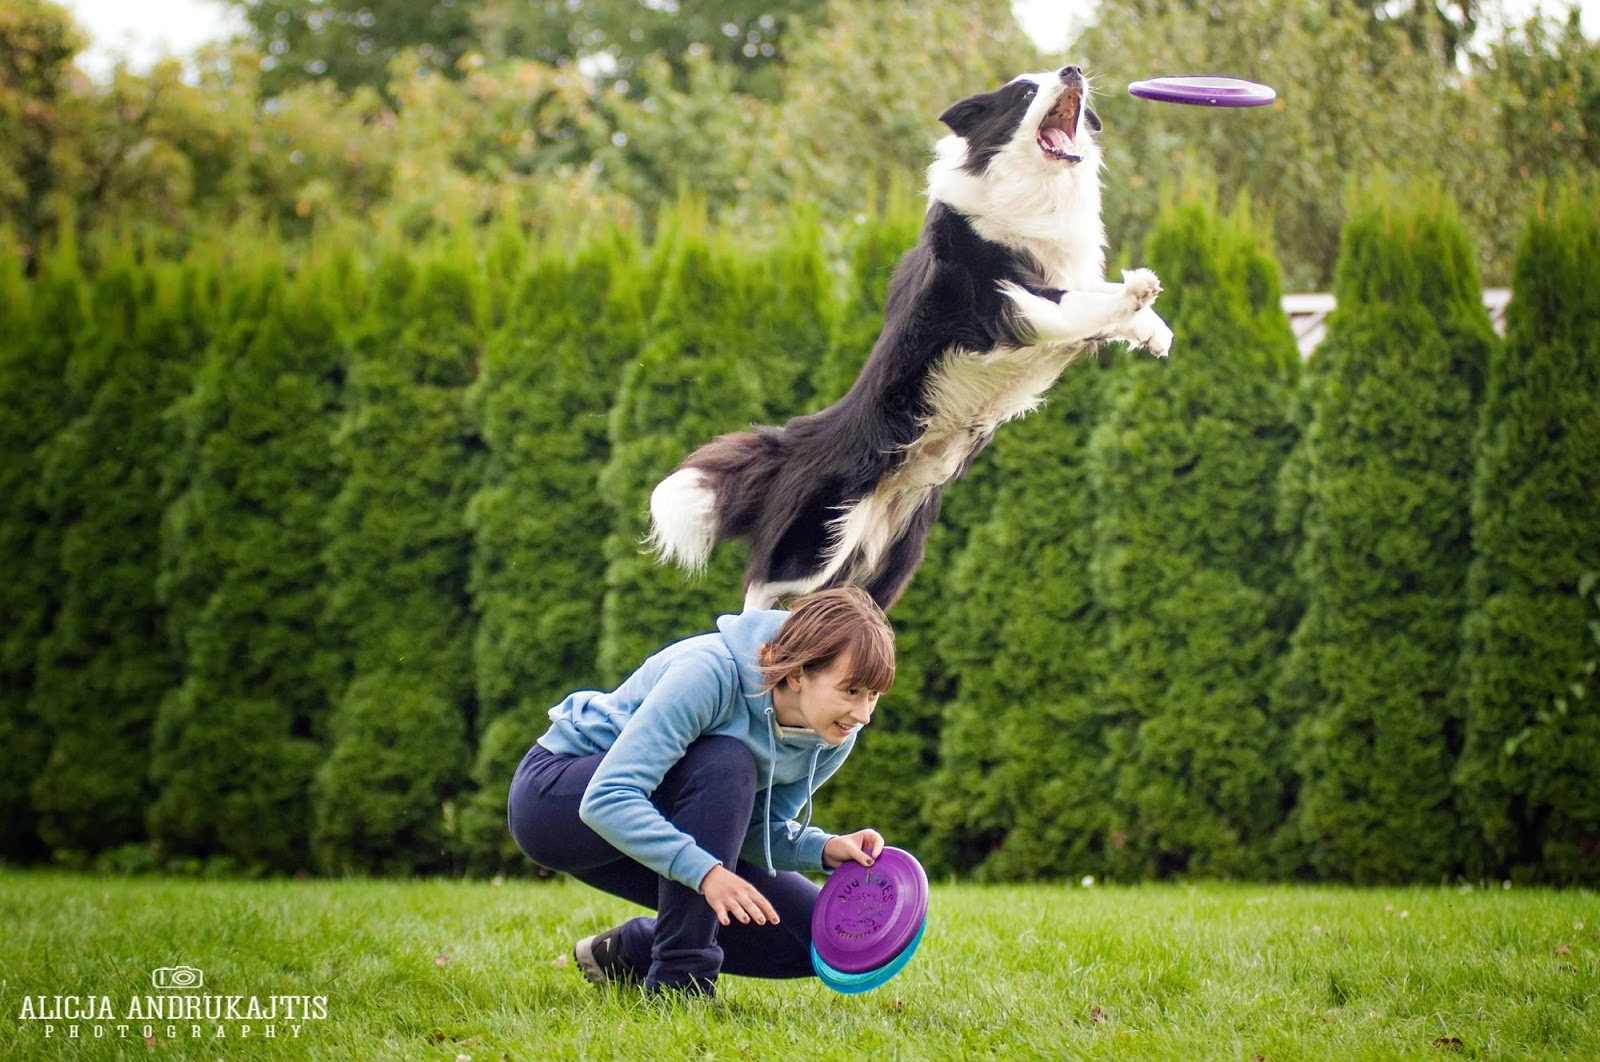 plato border collie dogfrisbee